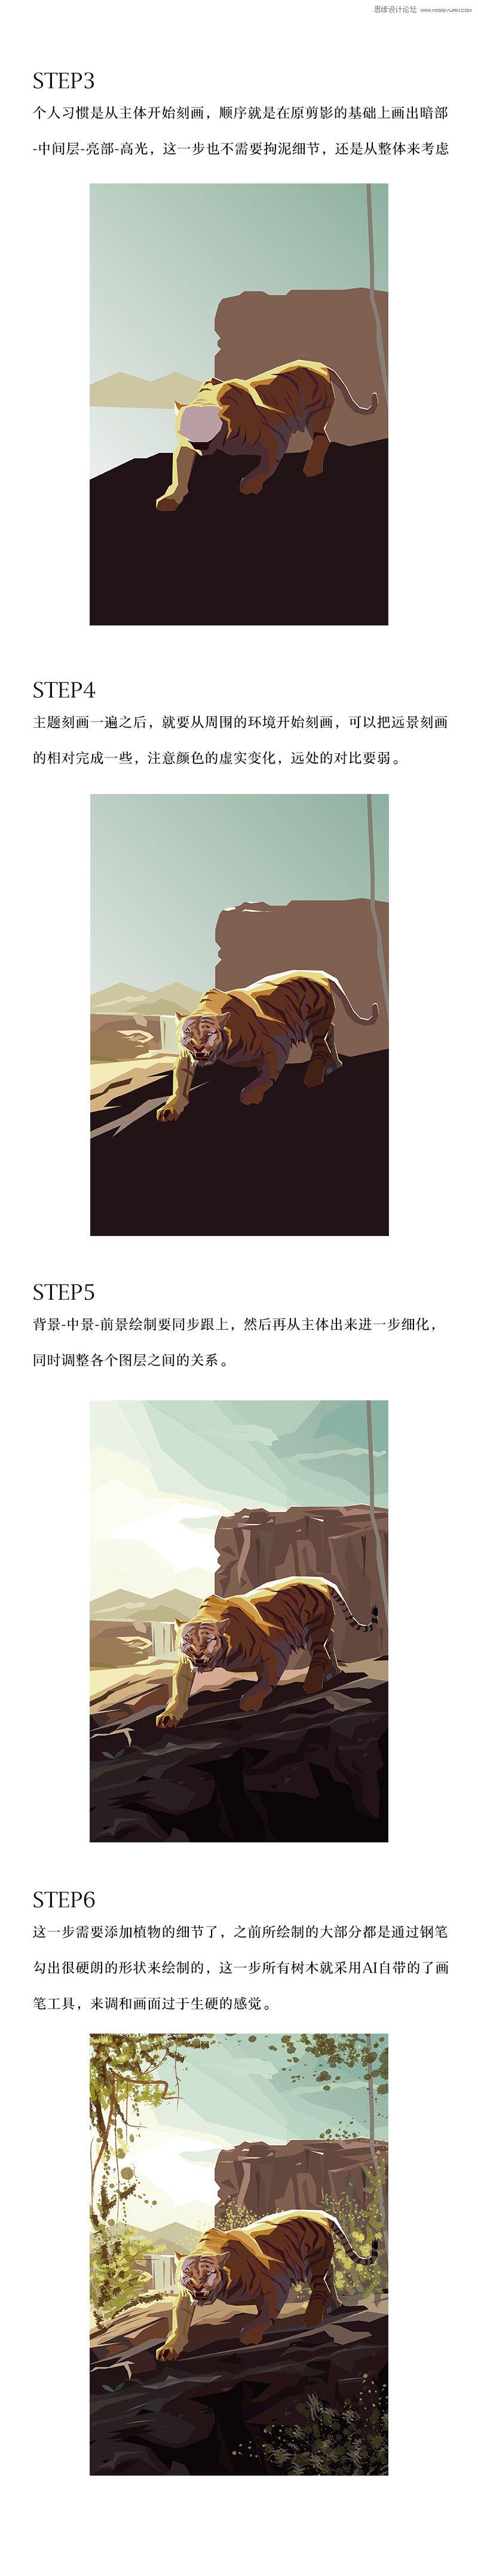 Illustrator绘制奇幻森林插画海报教程,PS教程,思缘教程网